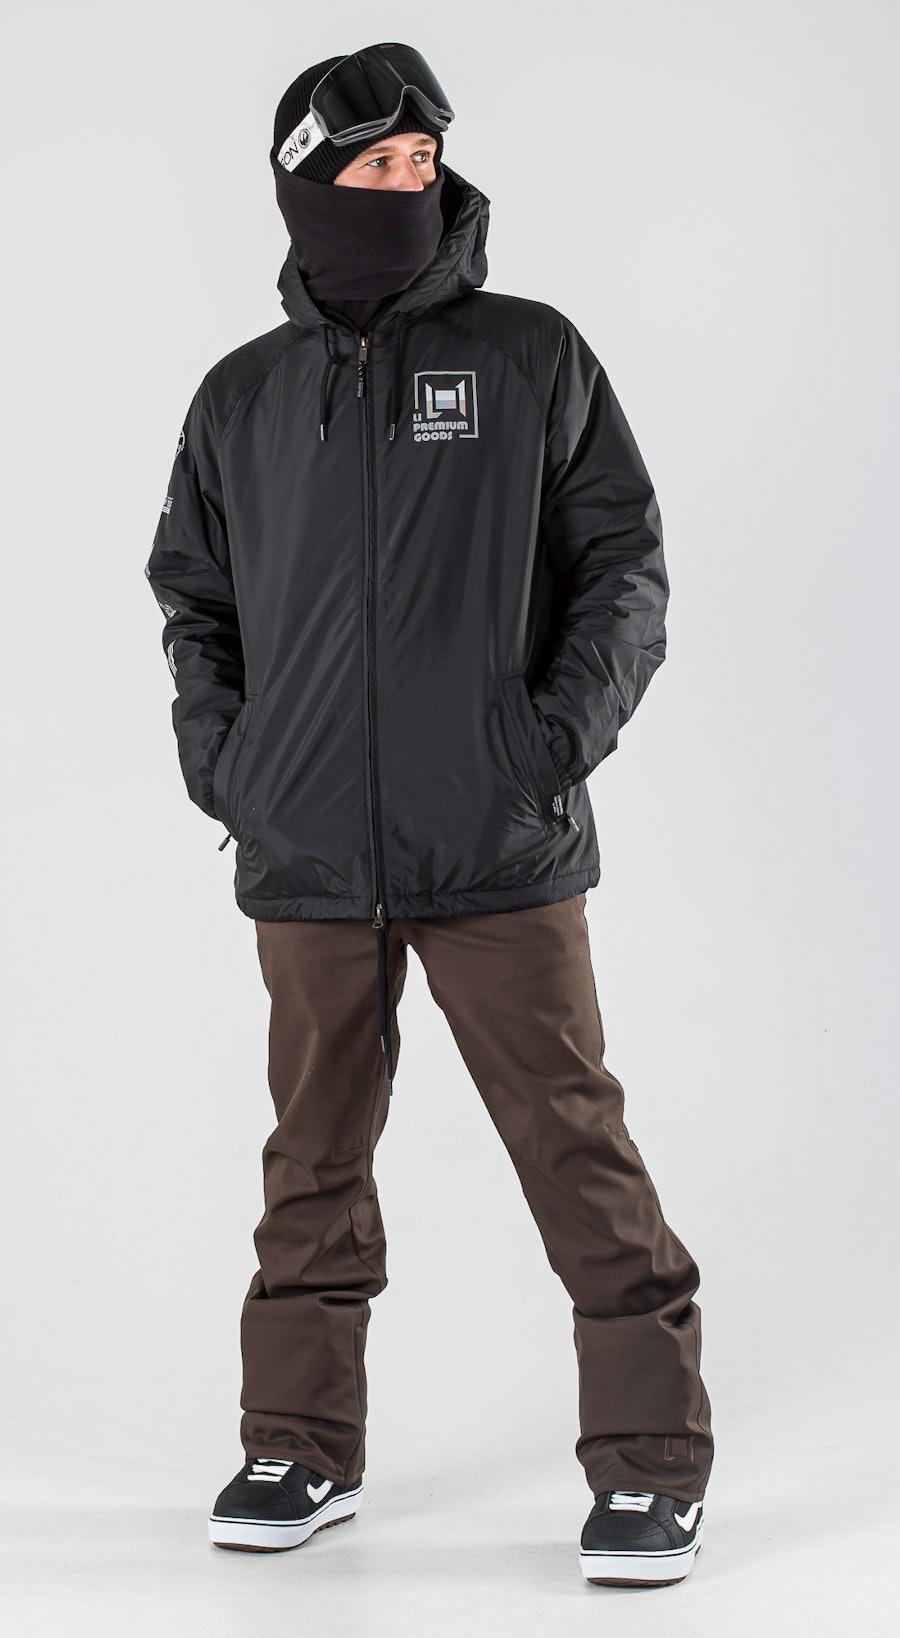 L1 Stooge Black Vêtements de Snowboard  Multi